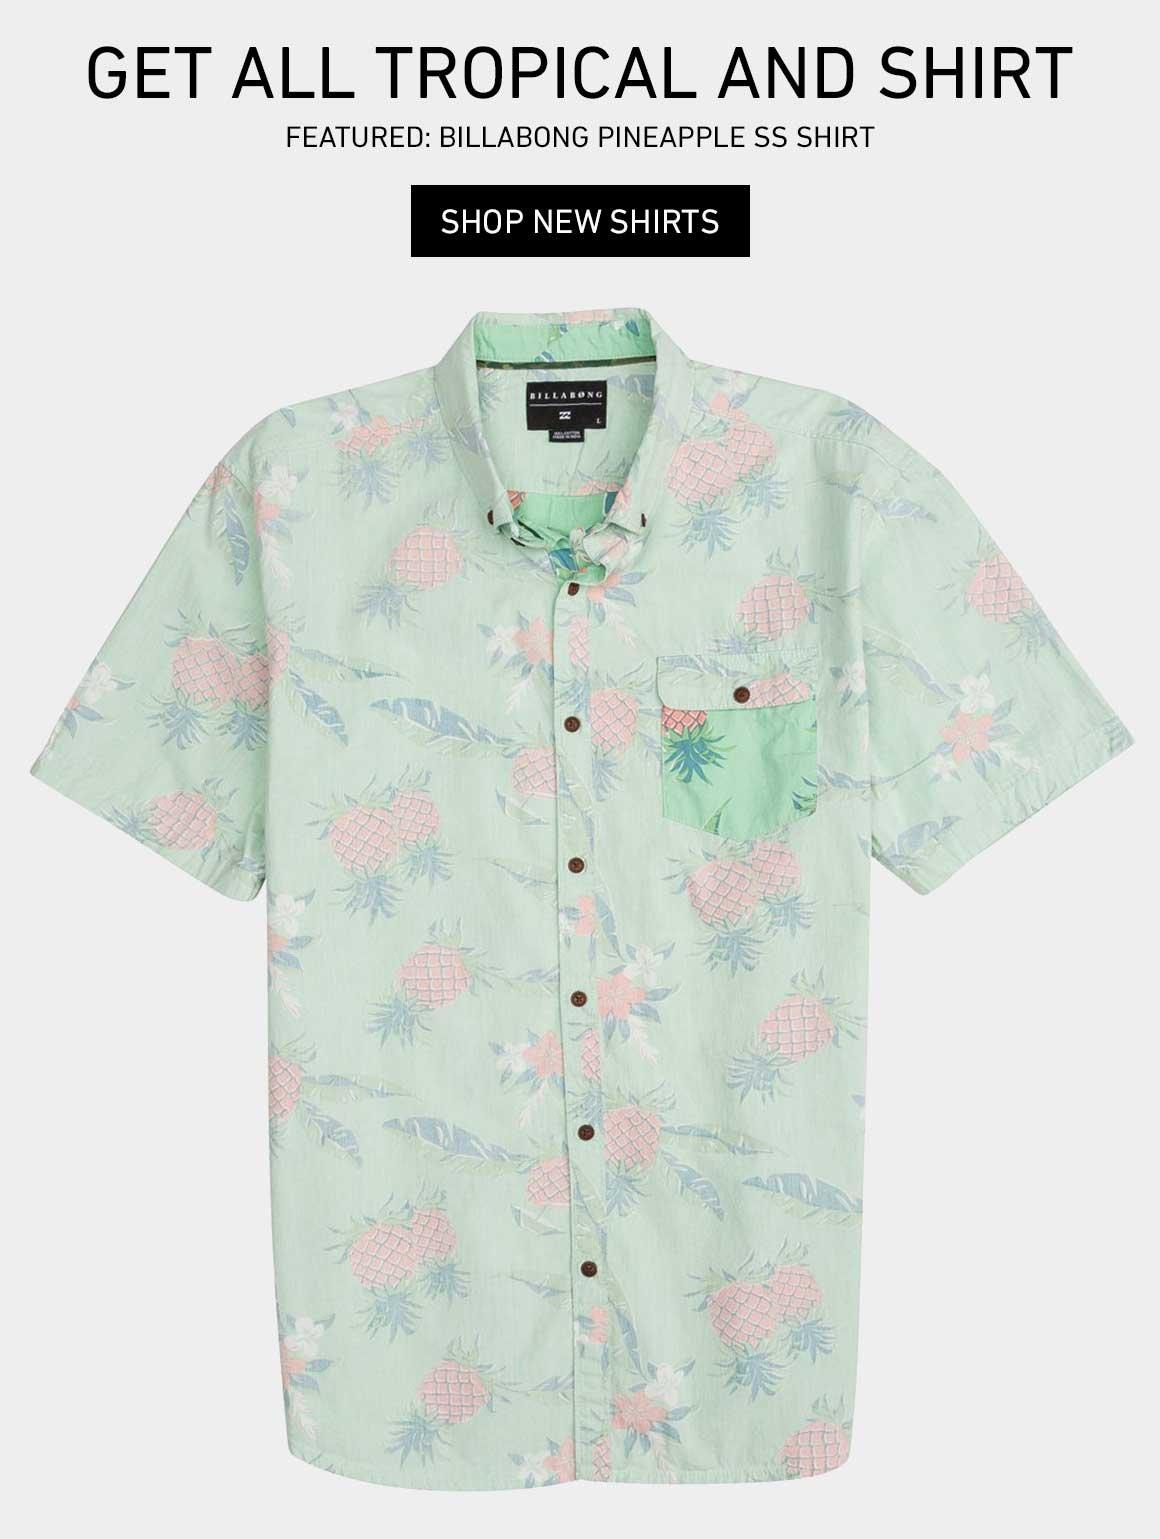 Pineapple Express: Shop New Shirts